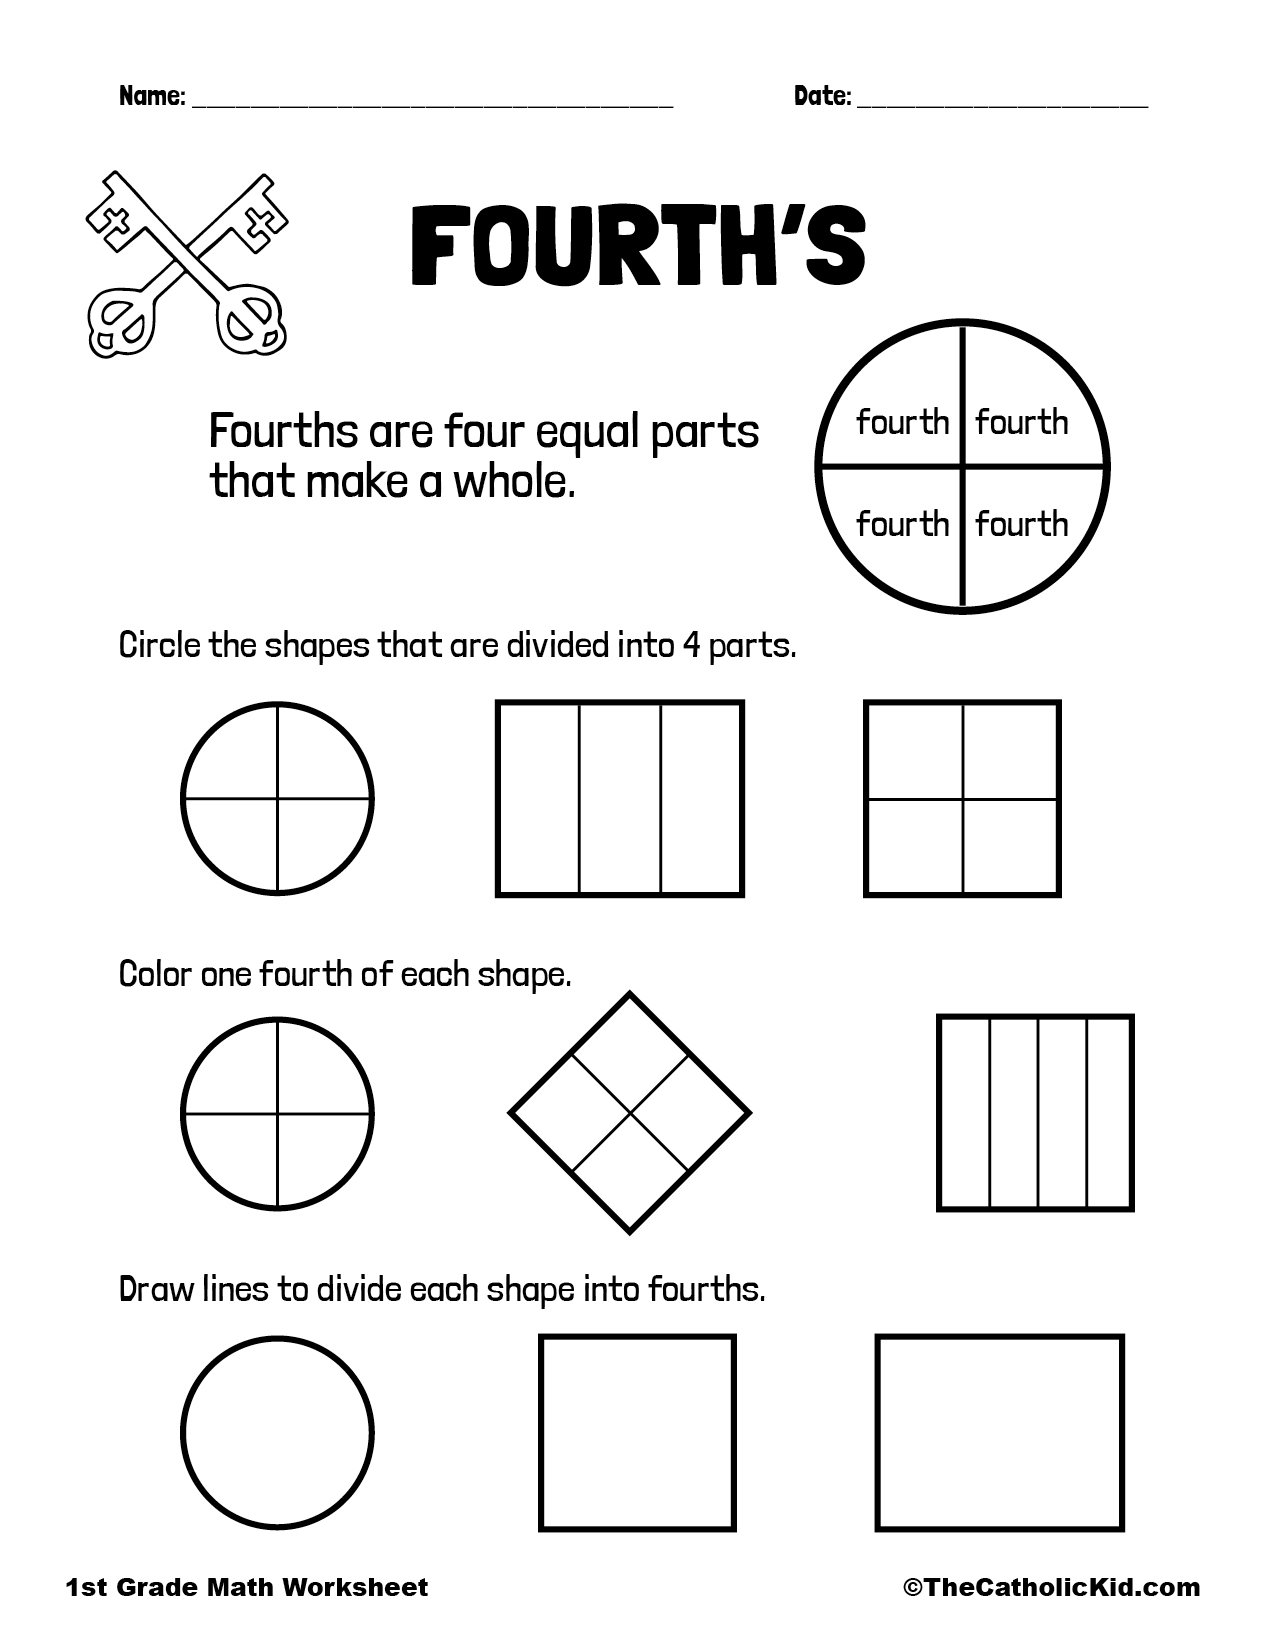 Fractions - Fourths - Quarters - 1st Grade Math Worksheet Catholic